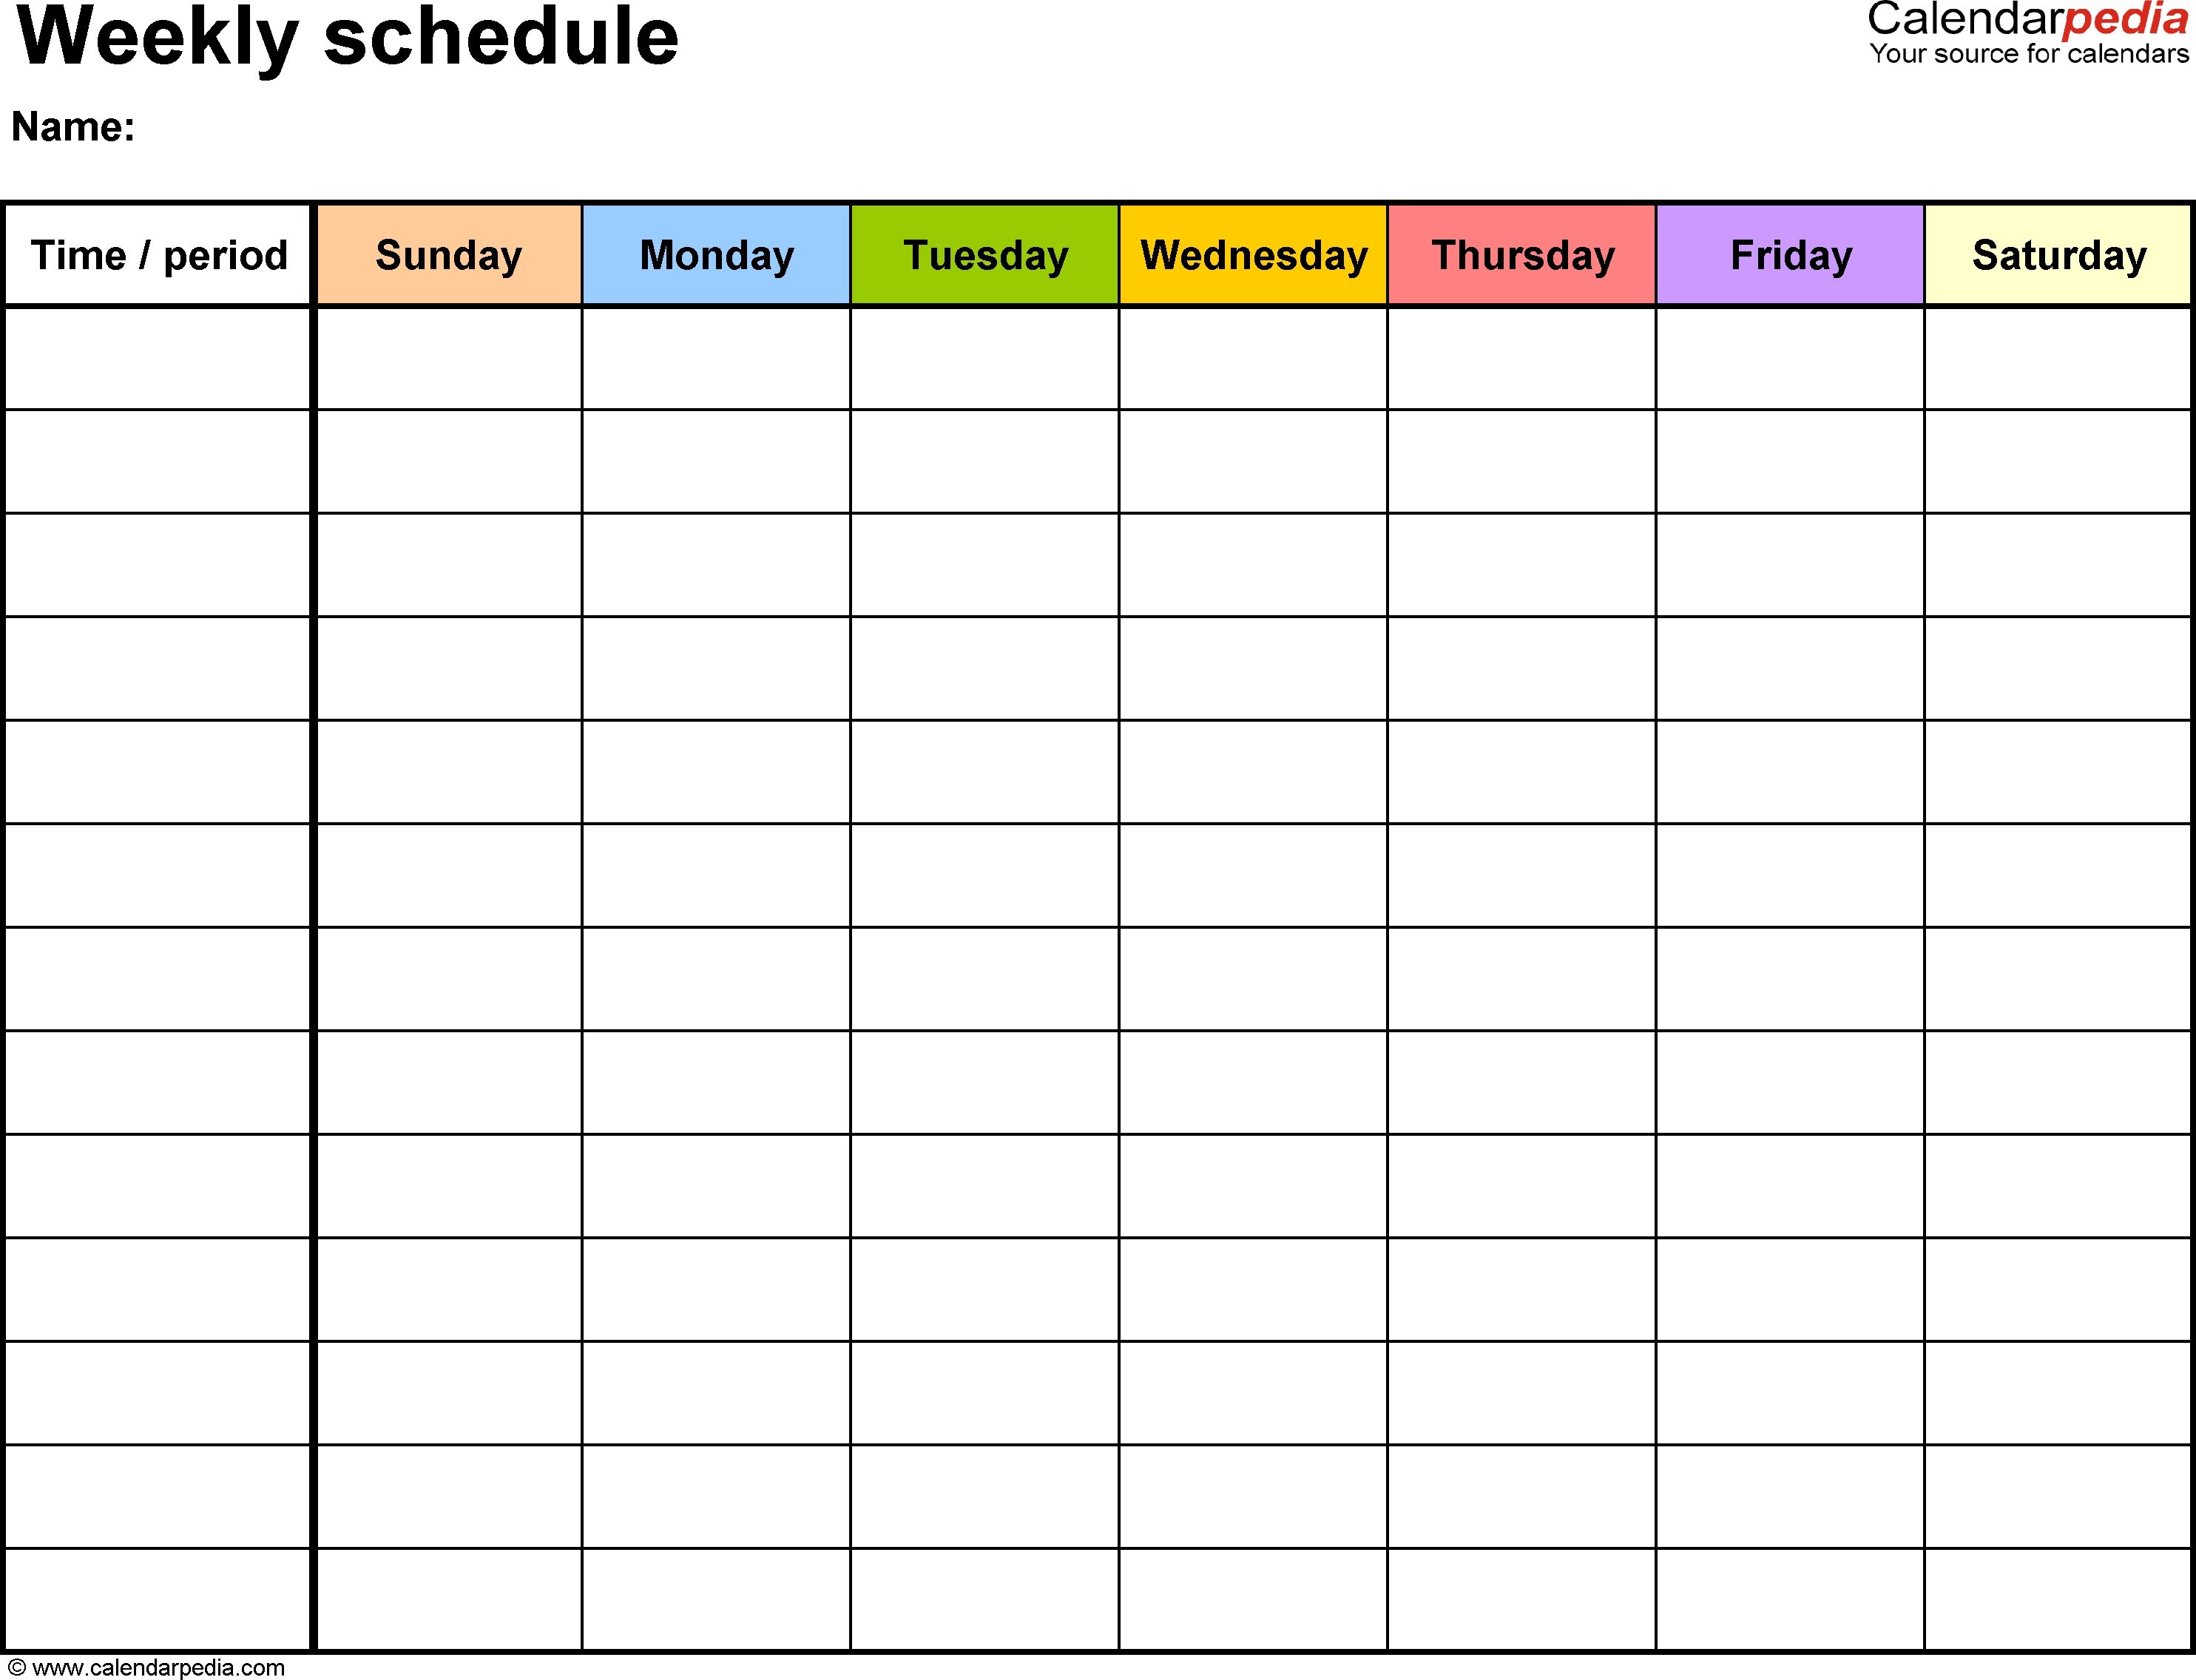 Free Weekly Schedule Templates For Word - 18 Templates  2 Week Calendar Printable Free